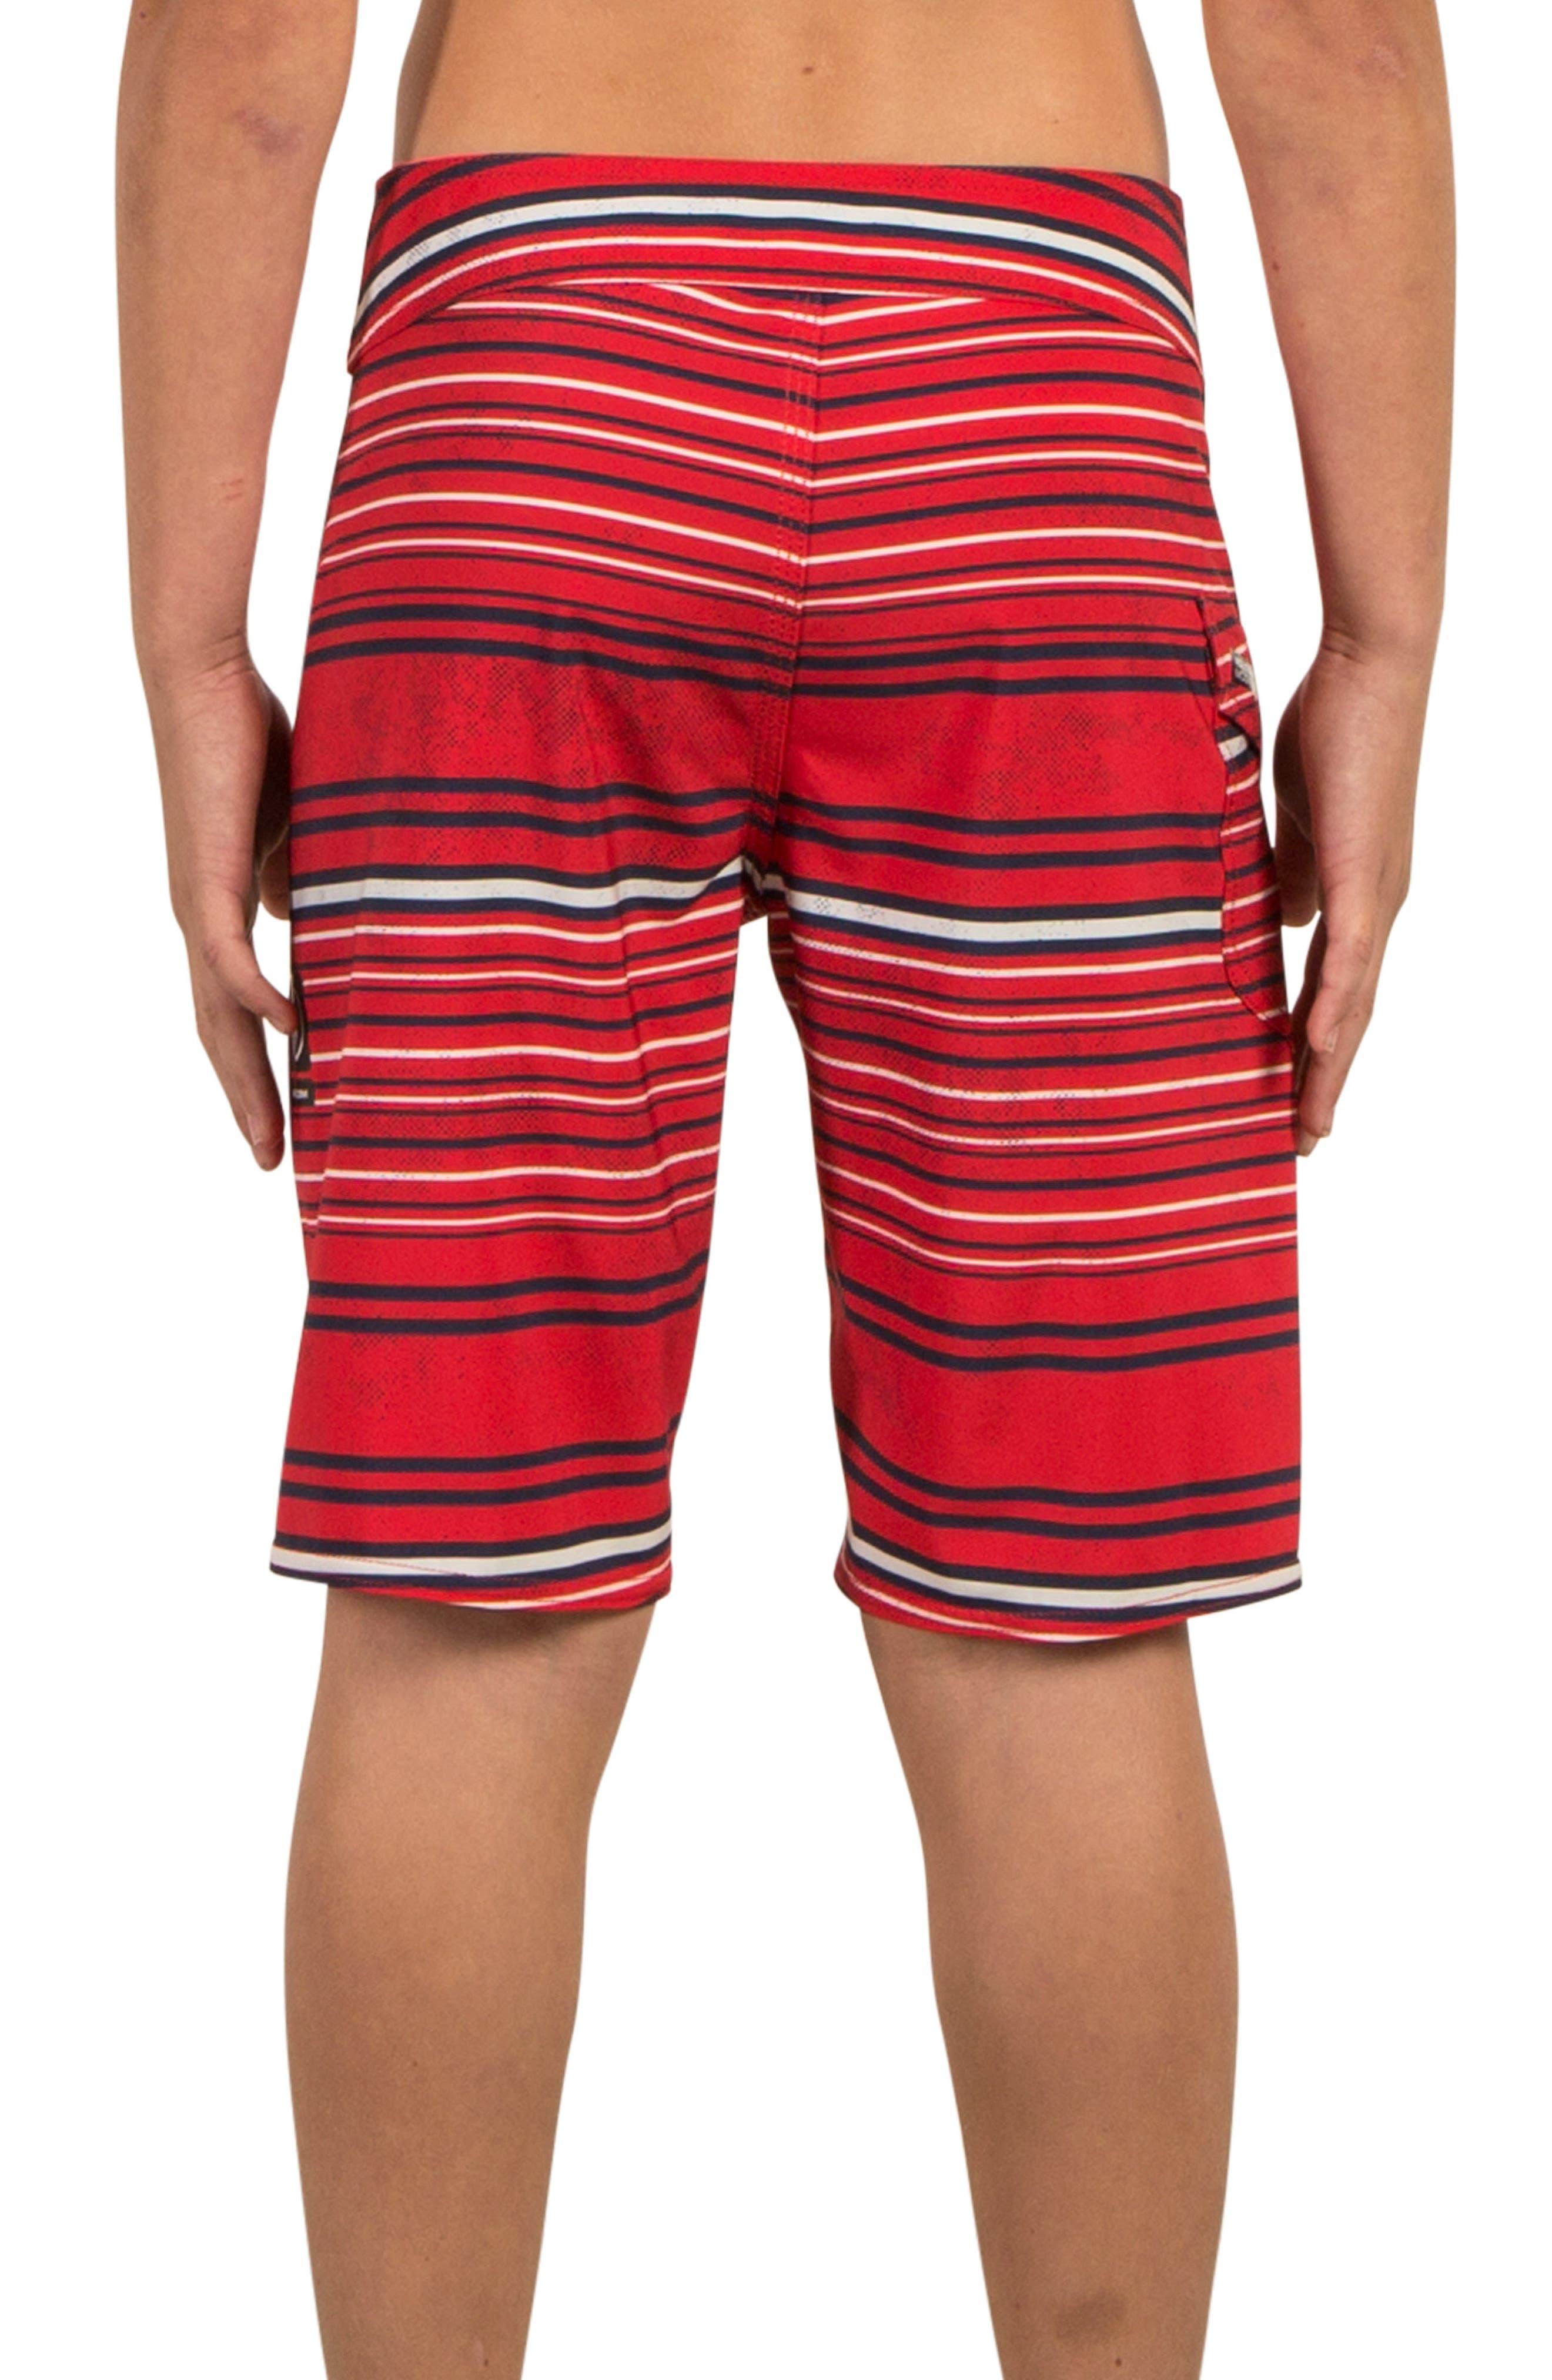 Alternate Image 2  - Volcom Magnetic Liney Board Shorts (Big Boys)